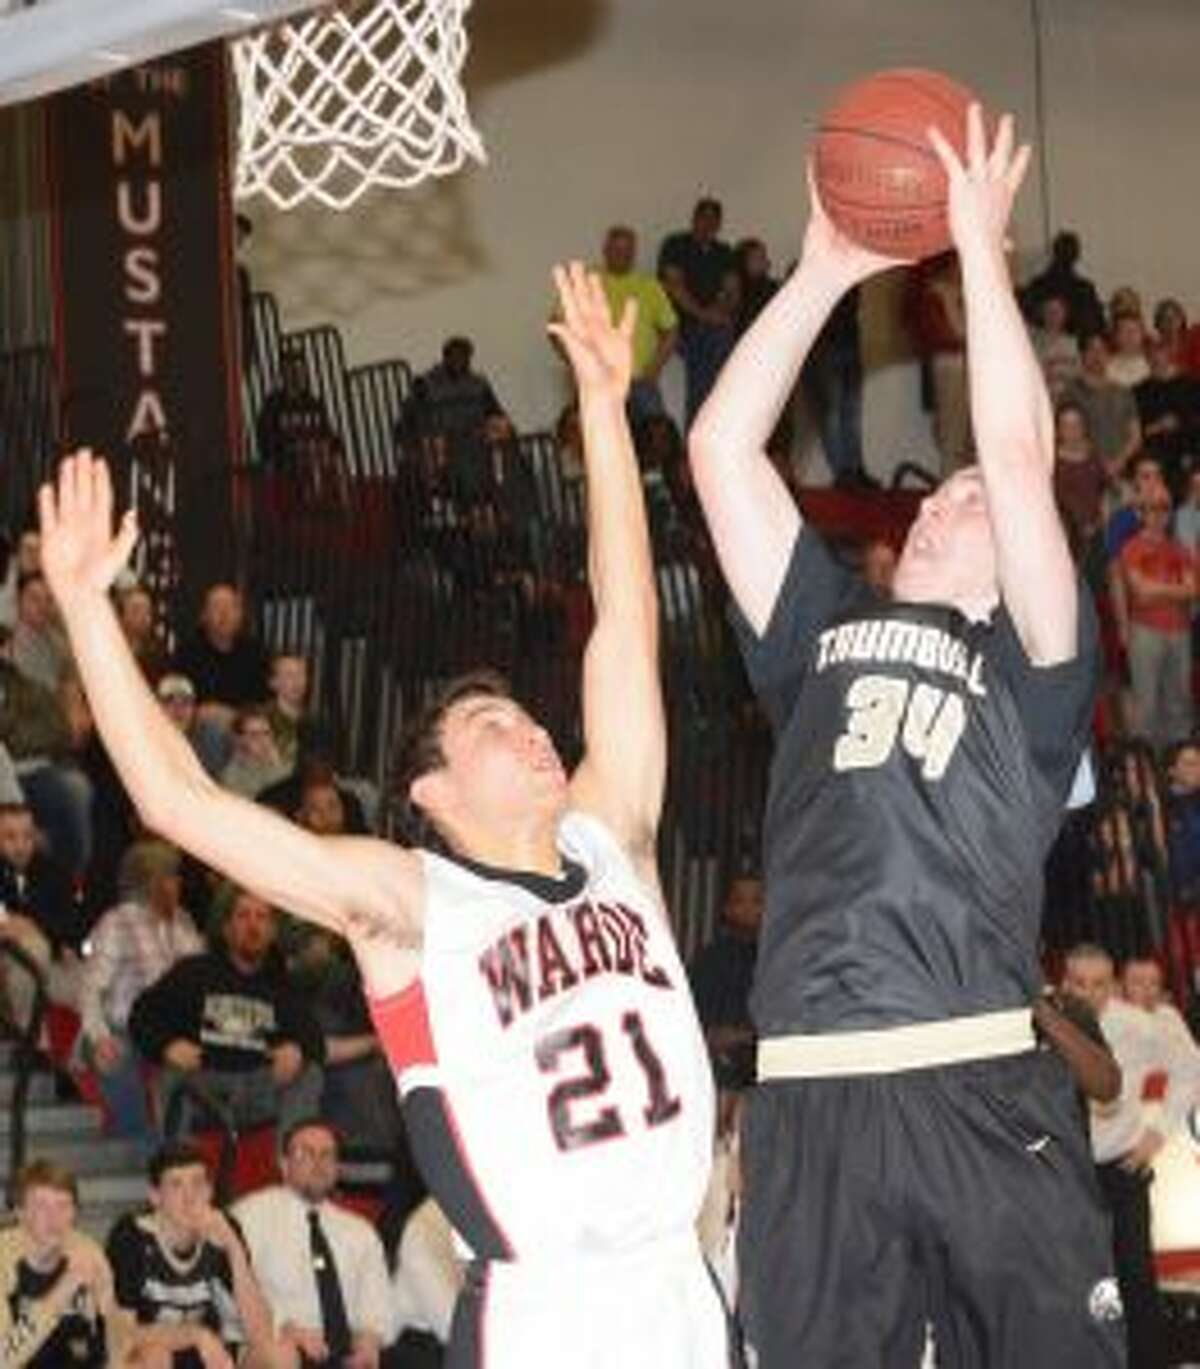 Evan Gutowski scored 15 points, with 10 rebounds.